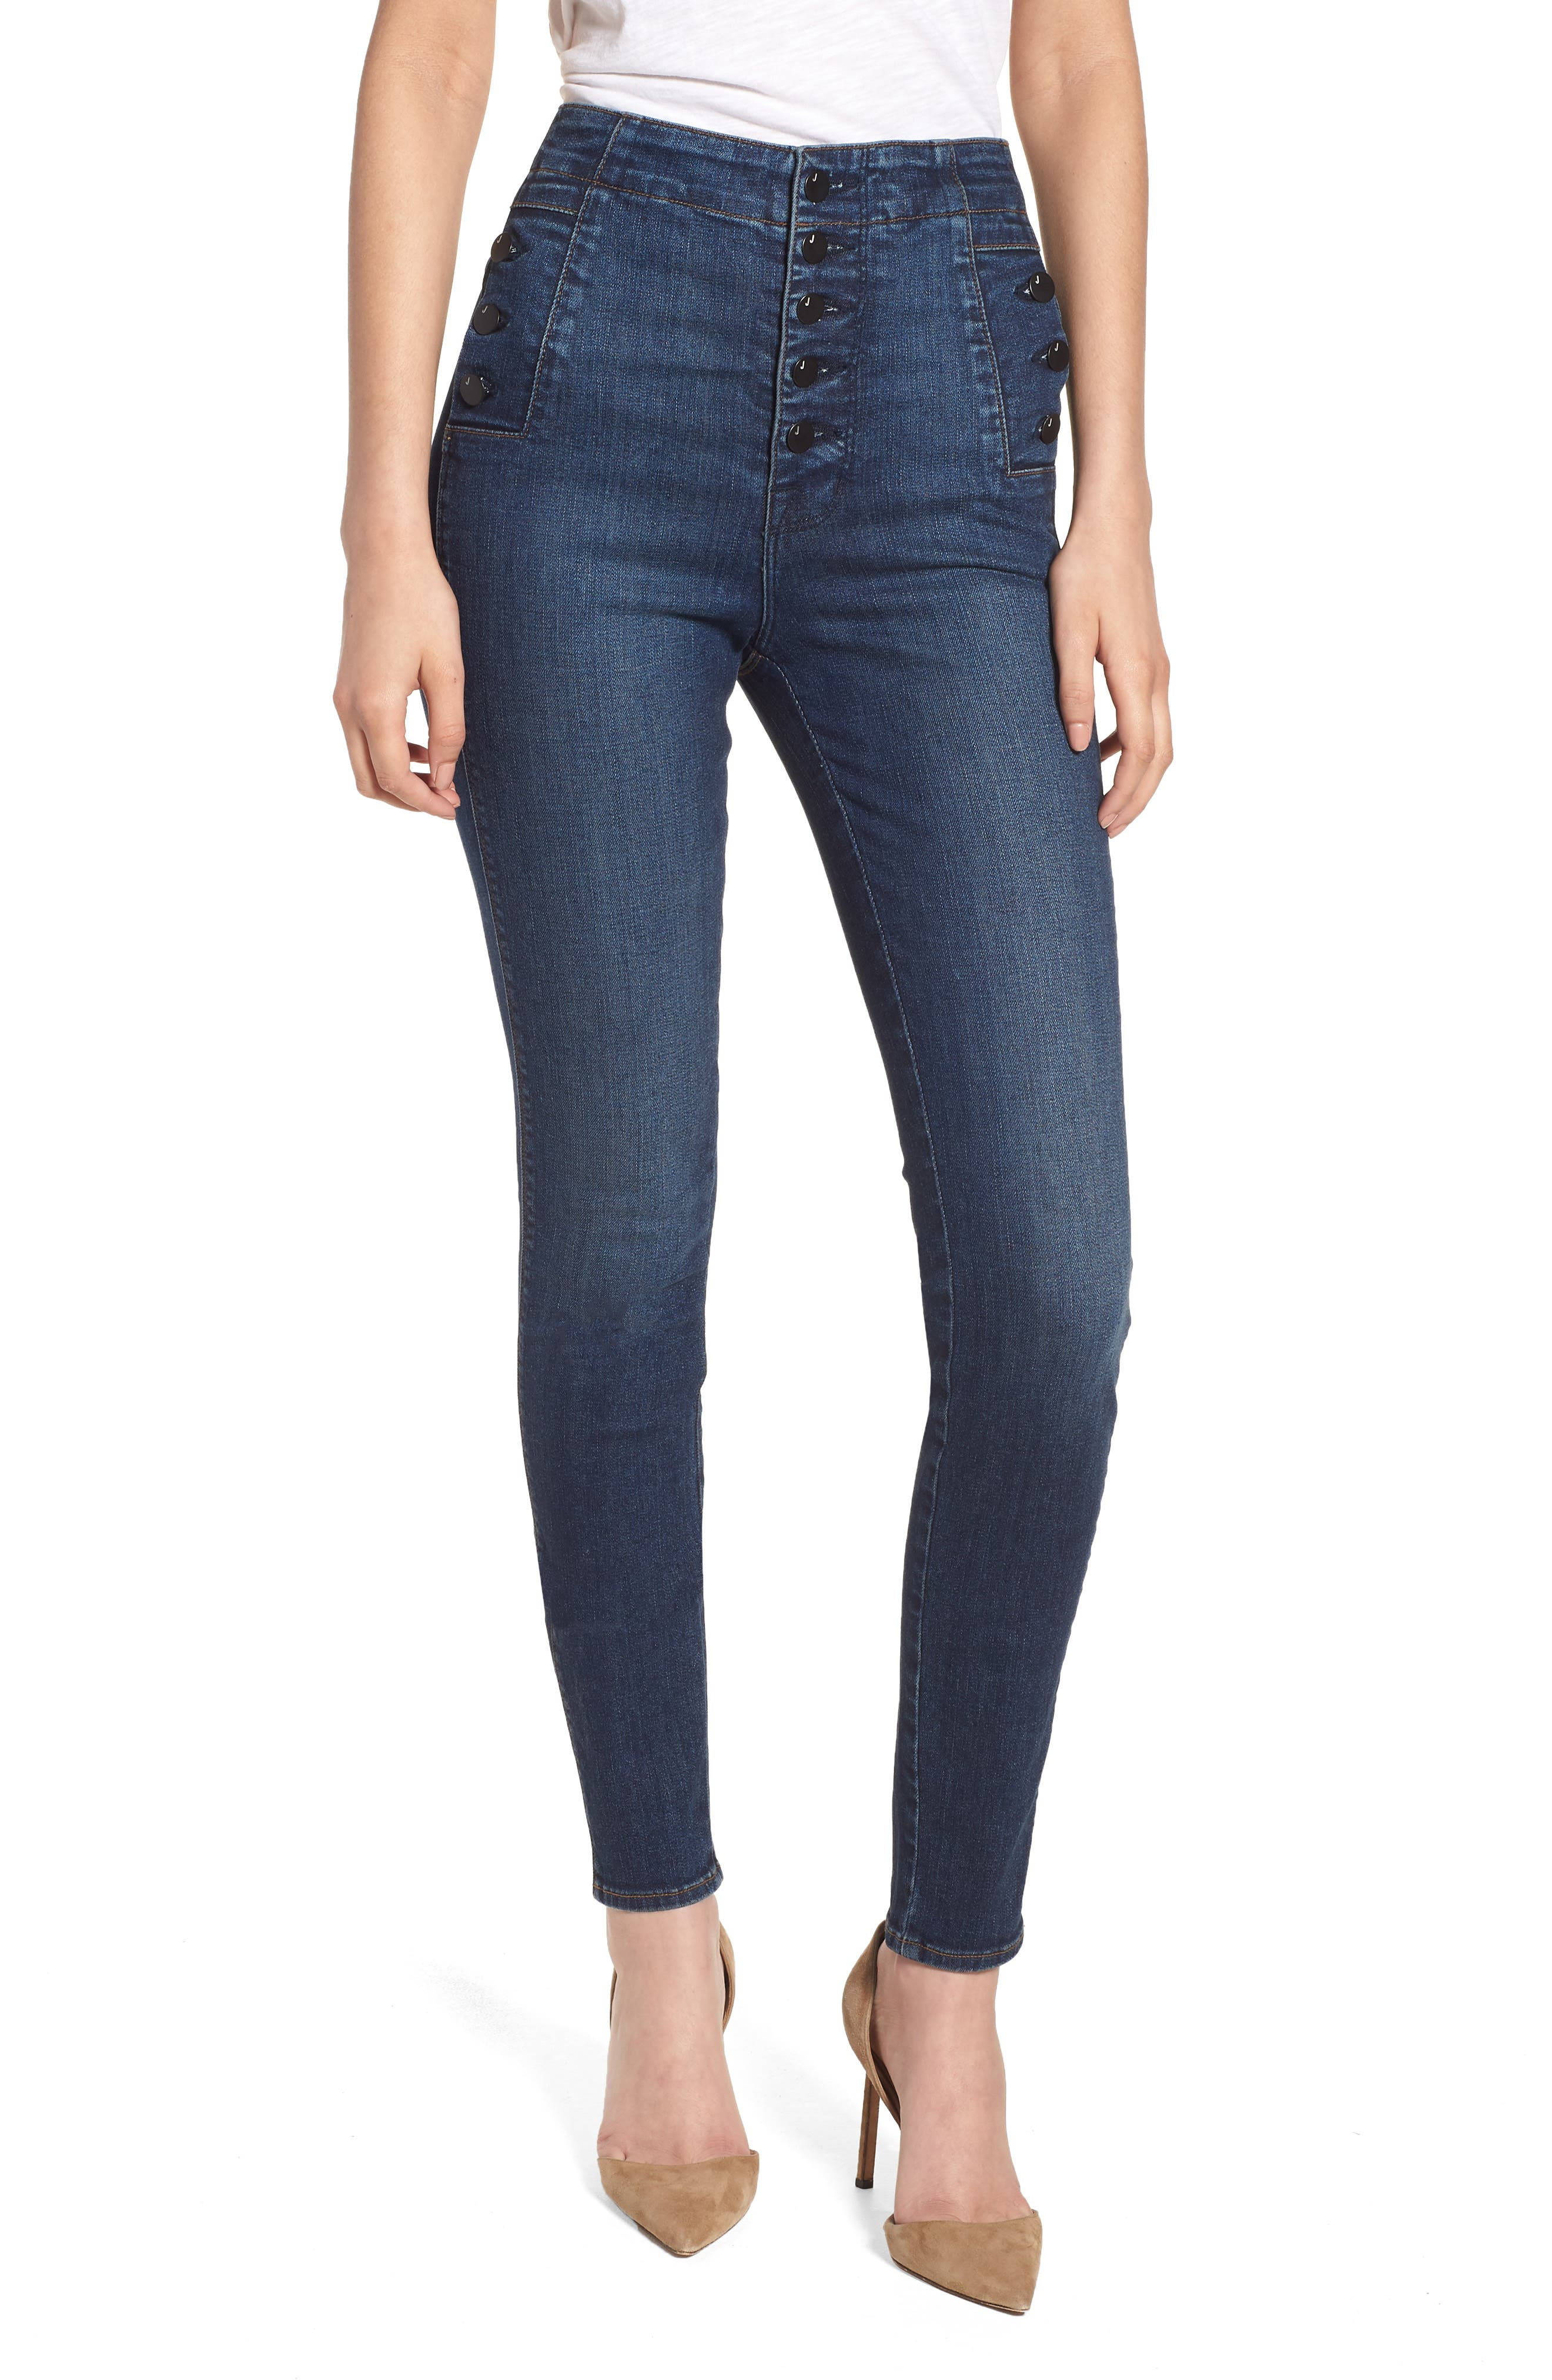 Natasha Sky High High Waist Skinny Jeans,                         Main,                         color, Revival